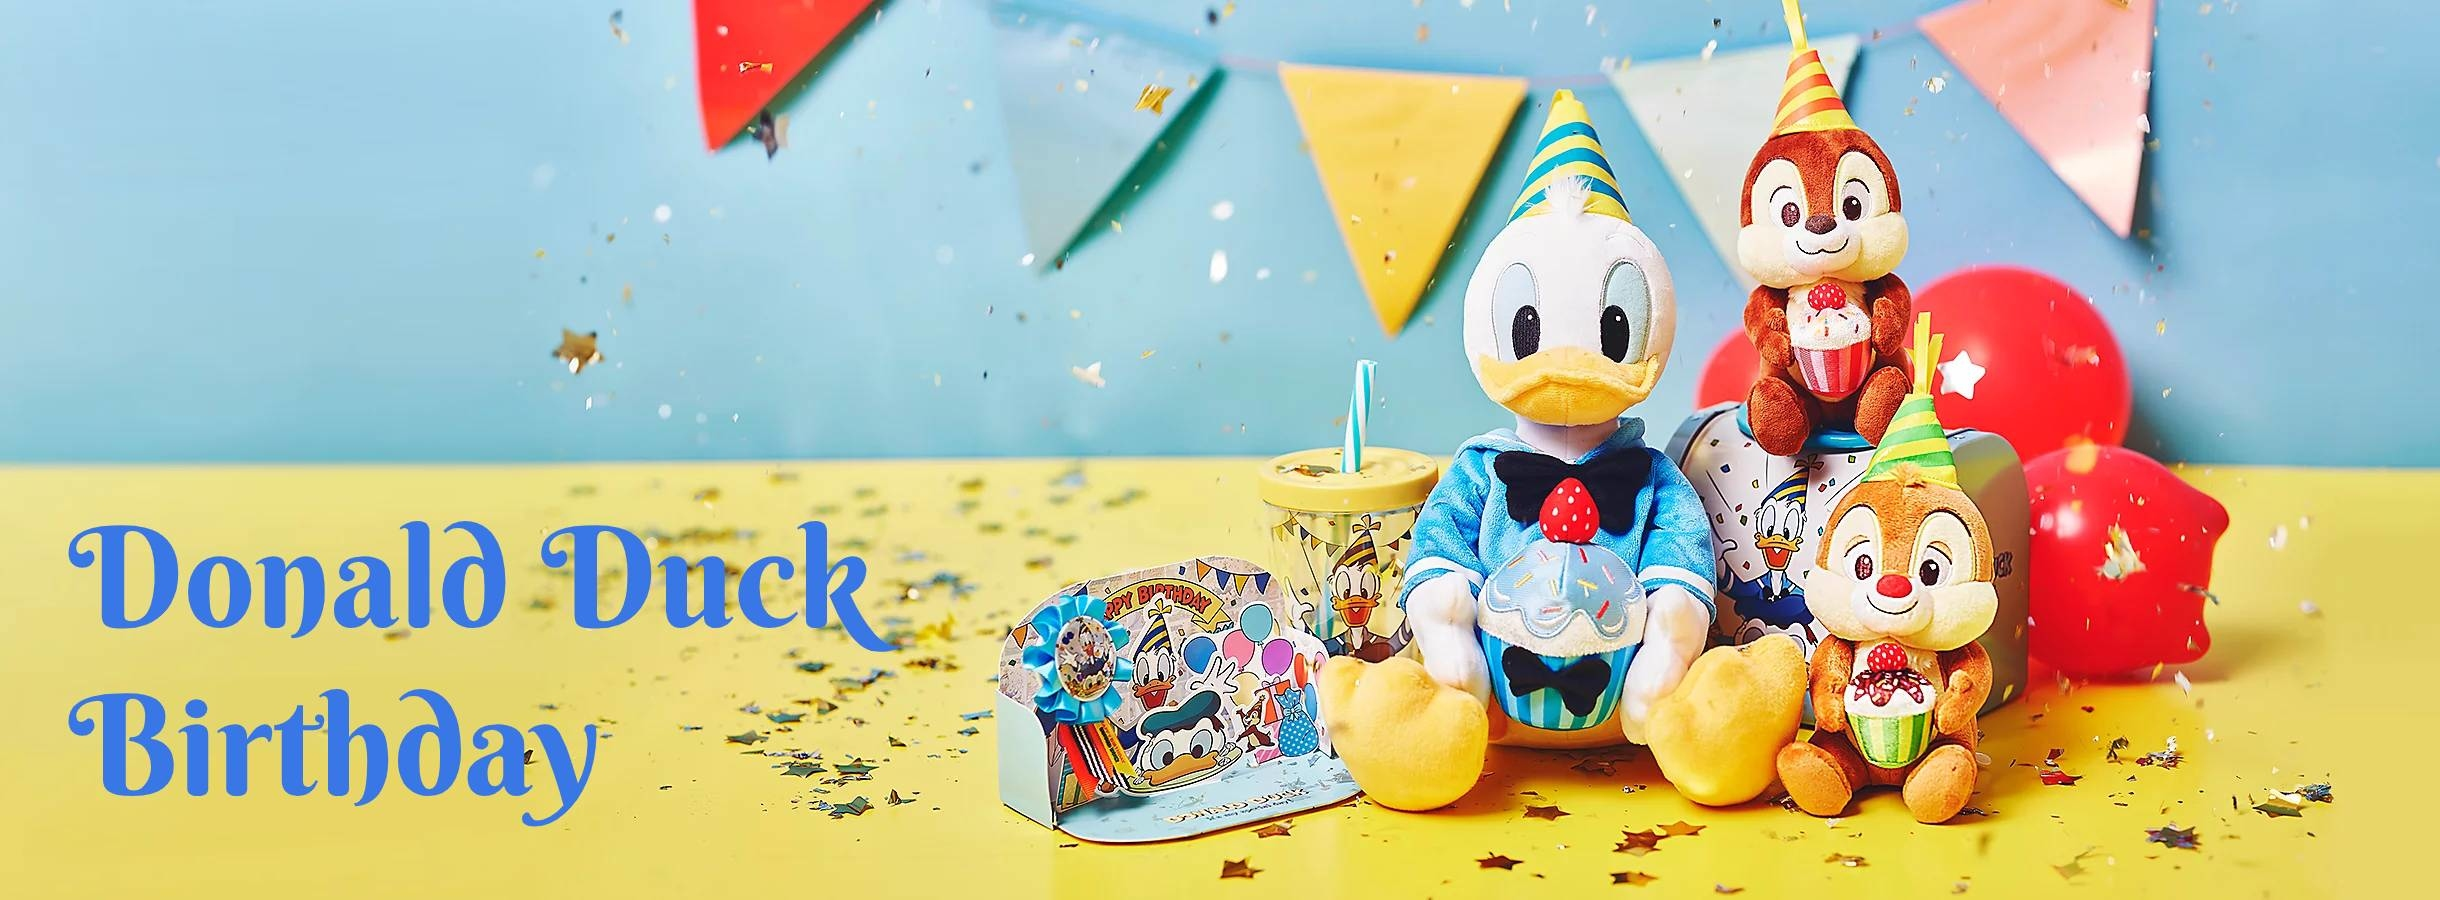 DisneyStore Japan Donald Duck Birthday 2020